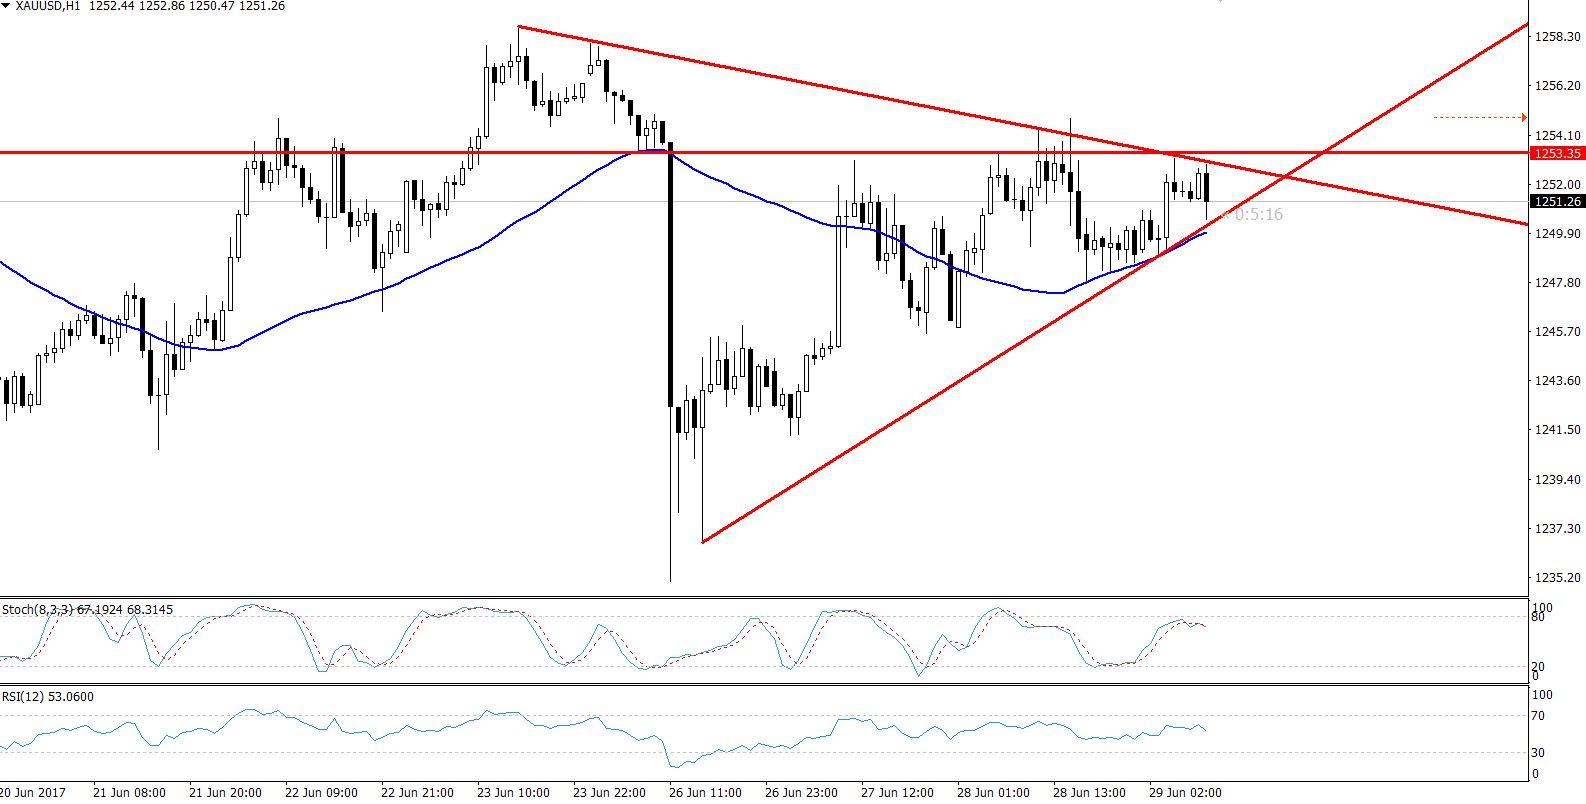 Gold - Hourly Chart - Triangle Pattern